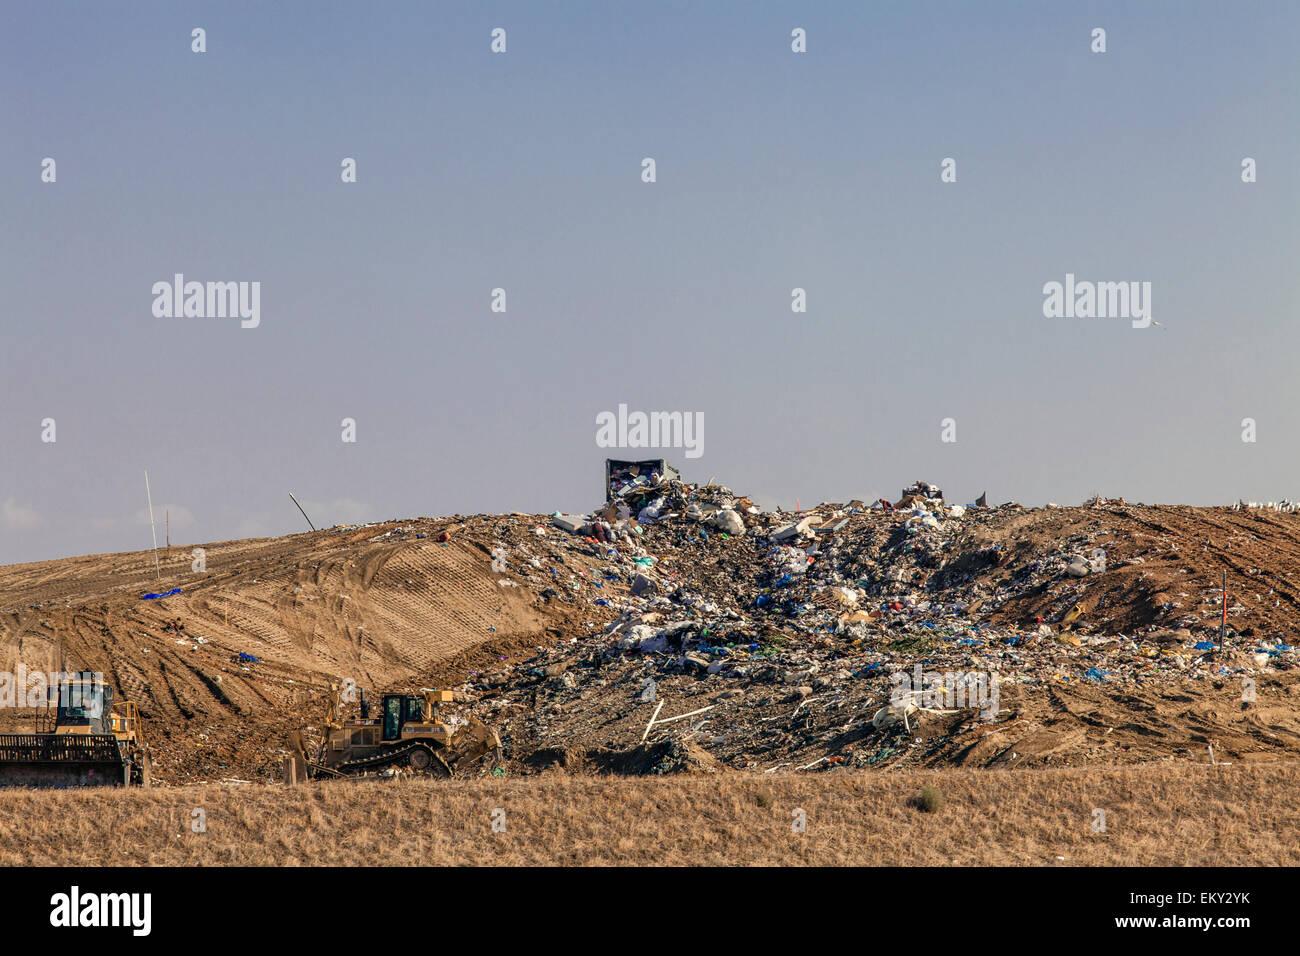 Landfill near Porterville, Tulare County, San Joaquin Valley, California, USA Stock Photo